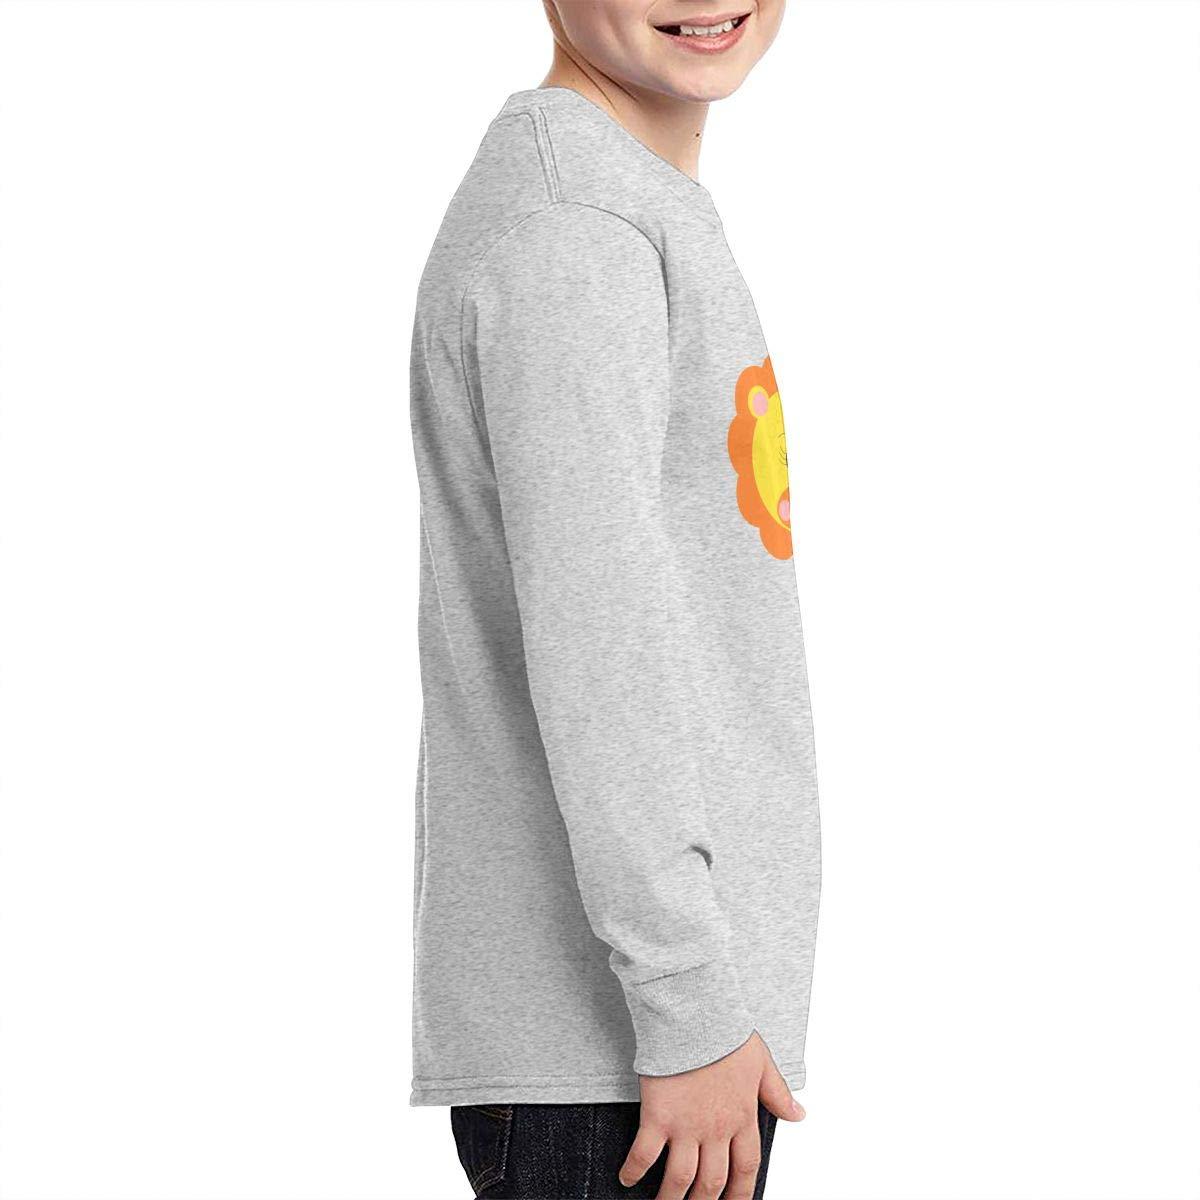 RhteGui Lion Boys /& Girls Junior Vintage Long Sleeve T-Shirt Black